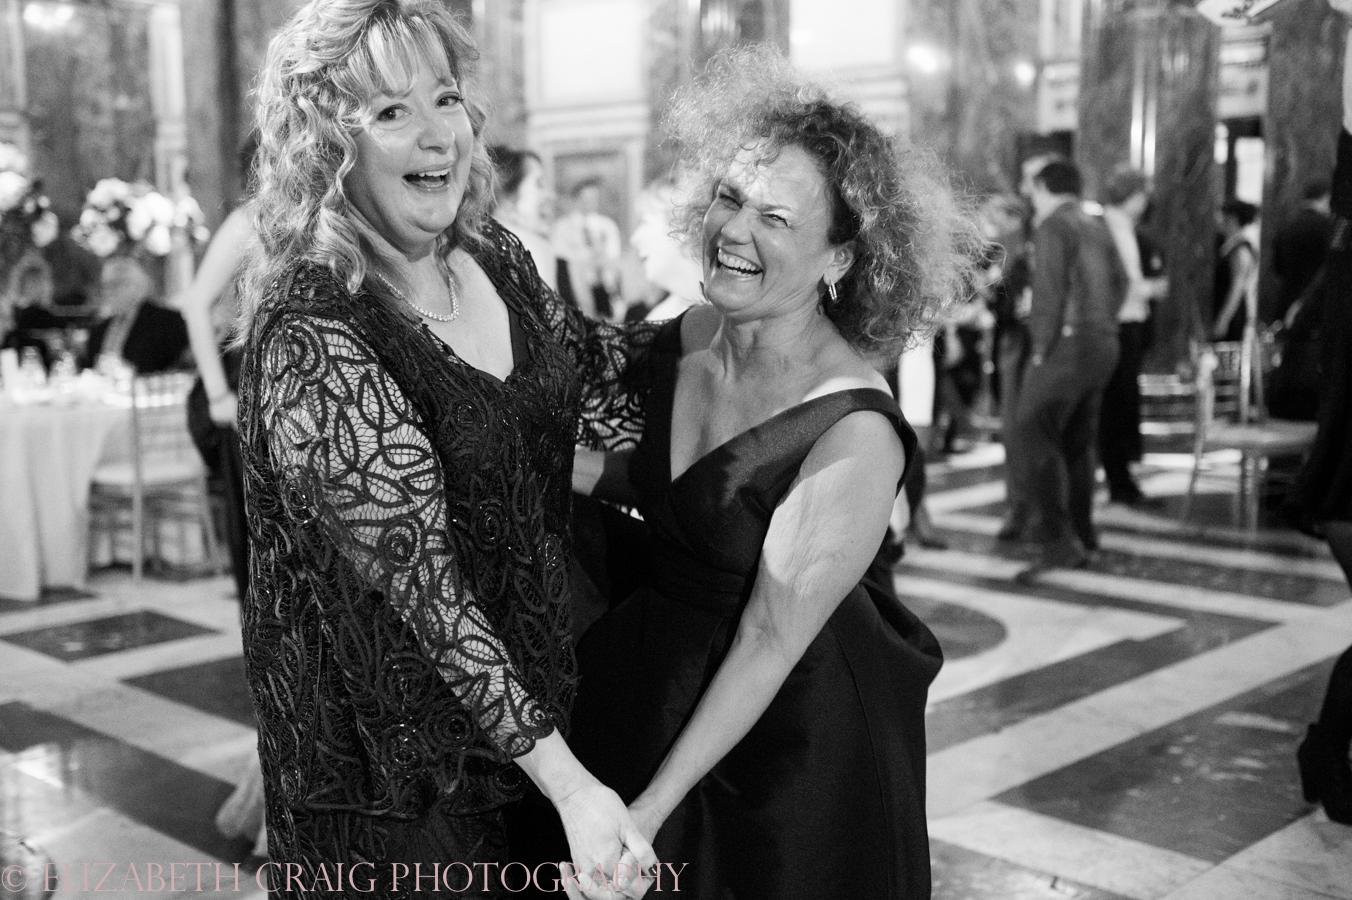 Carnegie Museum of Art Weddings | Elizabeth Craig Photography-0170